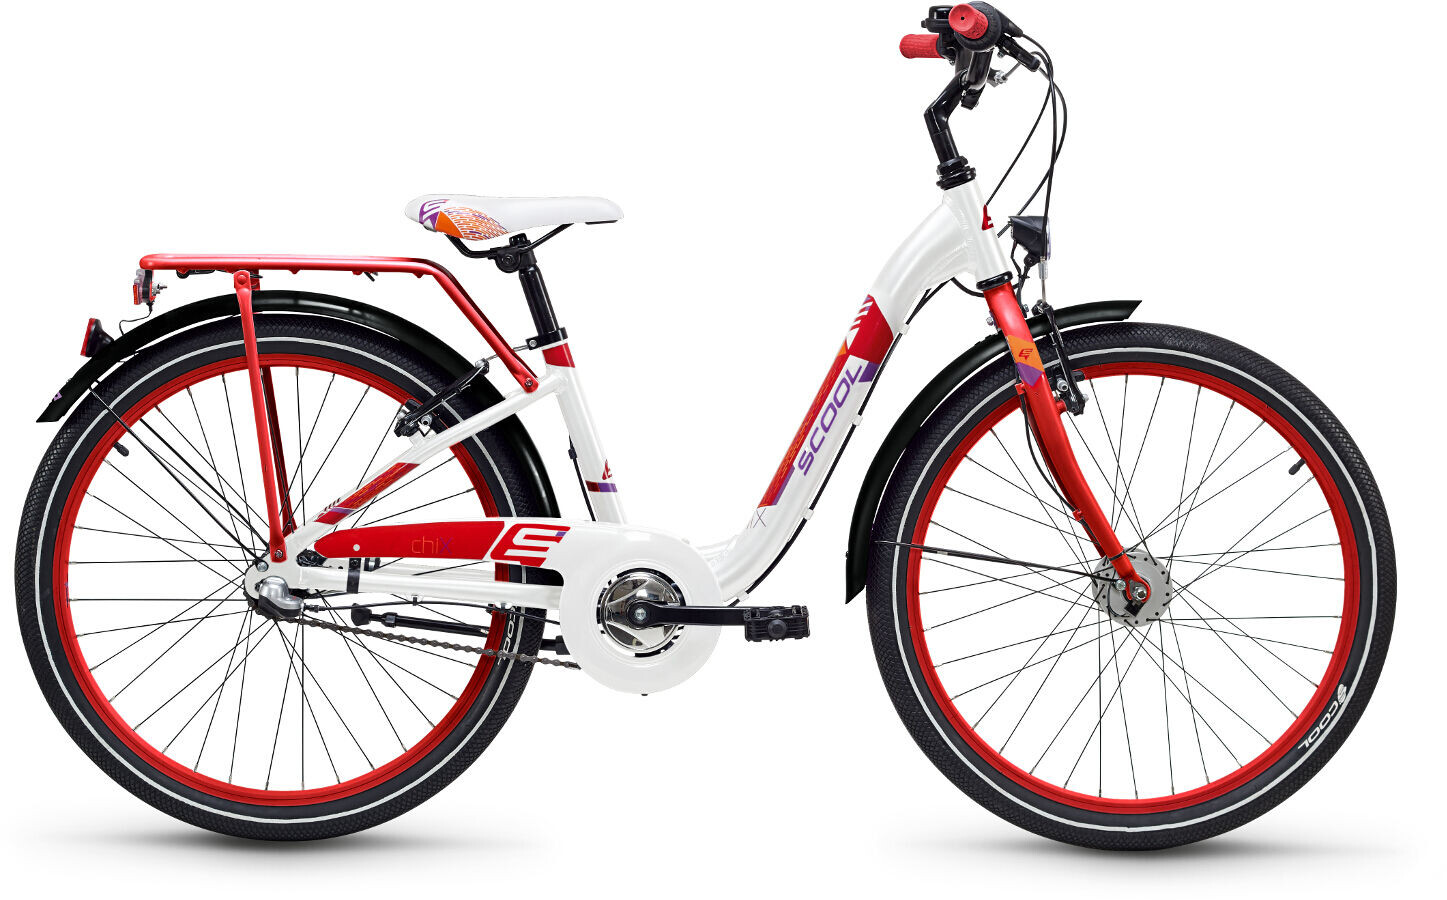 s'cool chiX 24 3-S alloy Kids, white/red (2019) | City